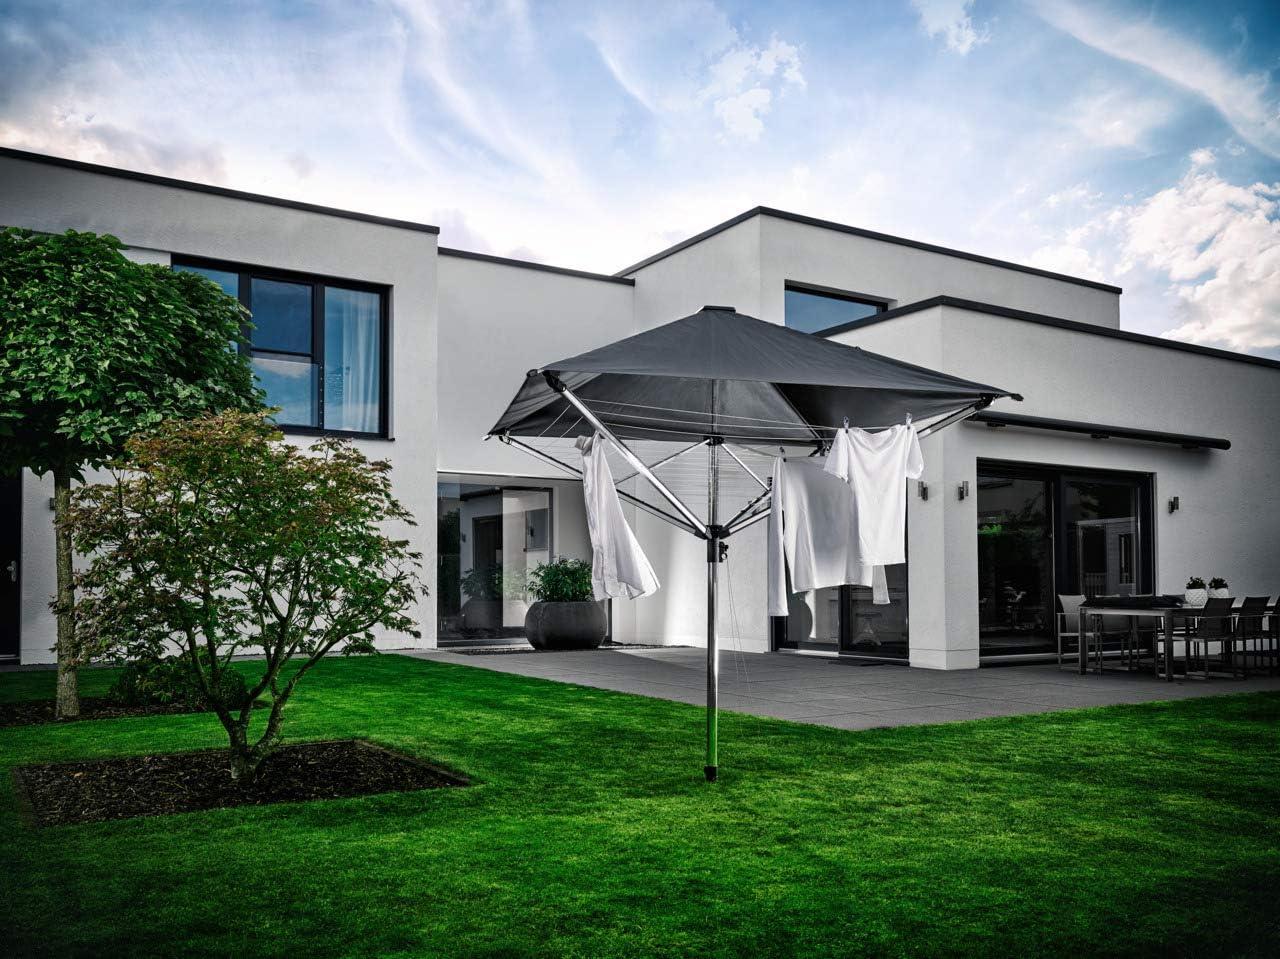 Leifheit Wäscheschirm TENDEDERO LINOPROTECT 400 1082100, Aluminio, Antracita, 220,5 x 80 x 60 cm: Amazon.es: Hogar